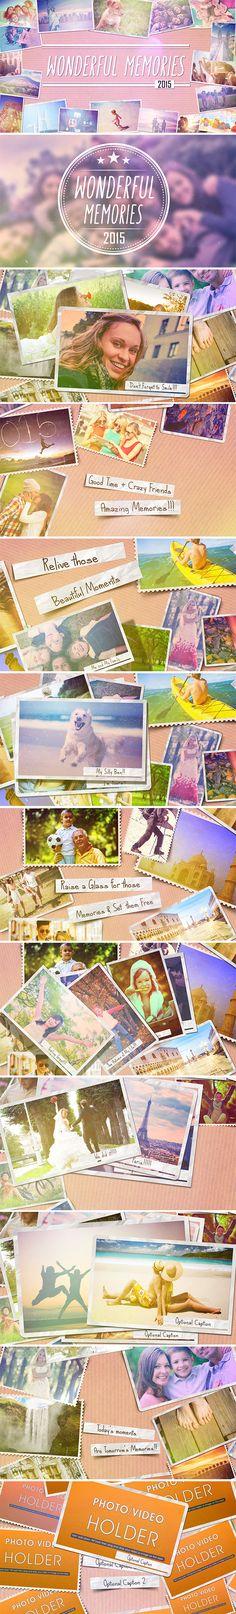 Download Here http://videohive.net/item/wonderful-memories-slide-show/11061159?ref=danywalker